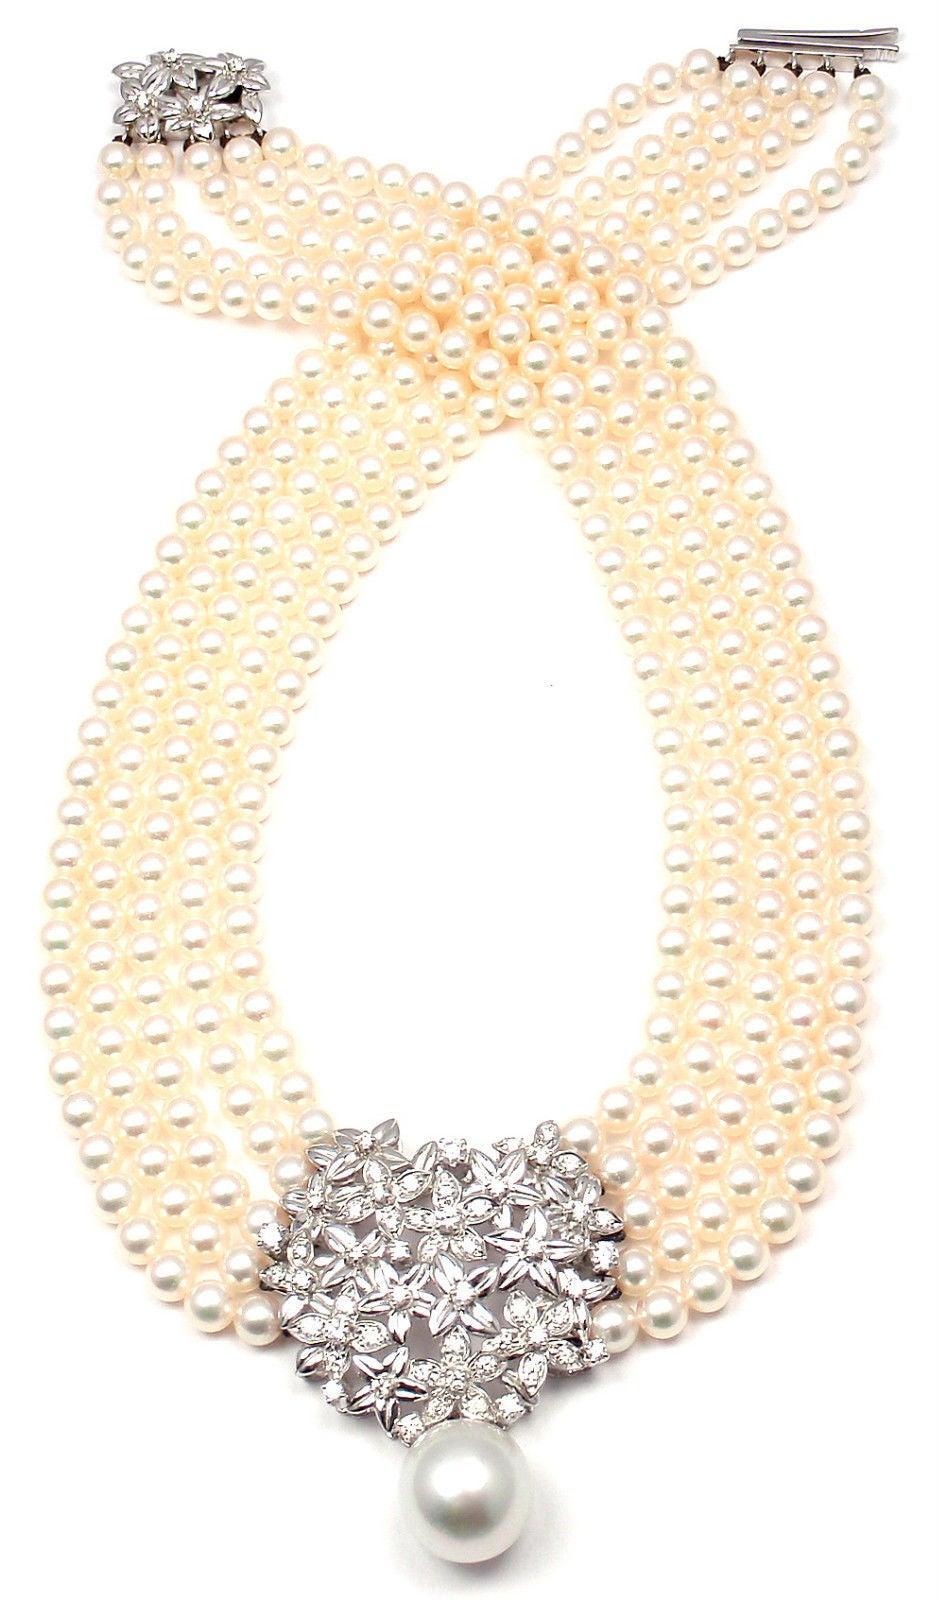 Mikimoto Five Strand Pearl Diamond White Gold Choker Necklace For Sale 6